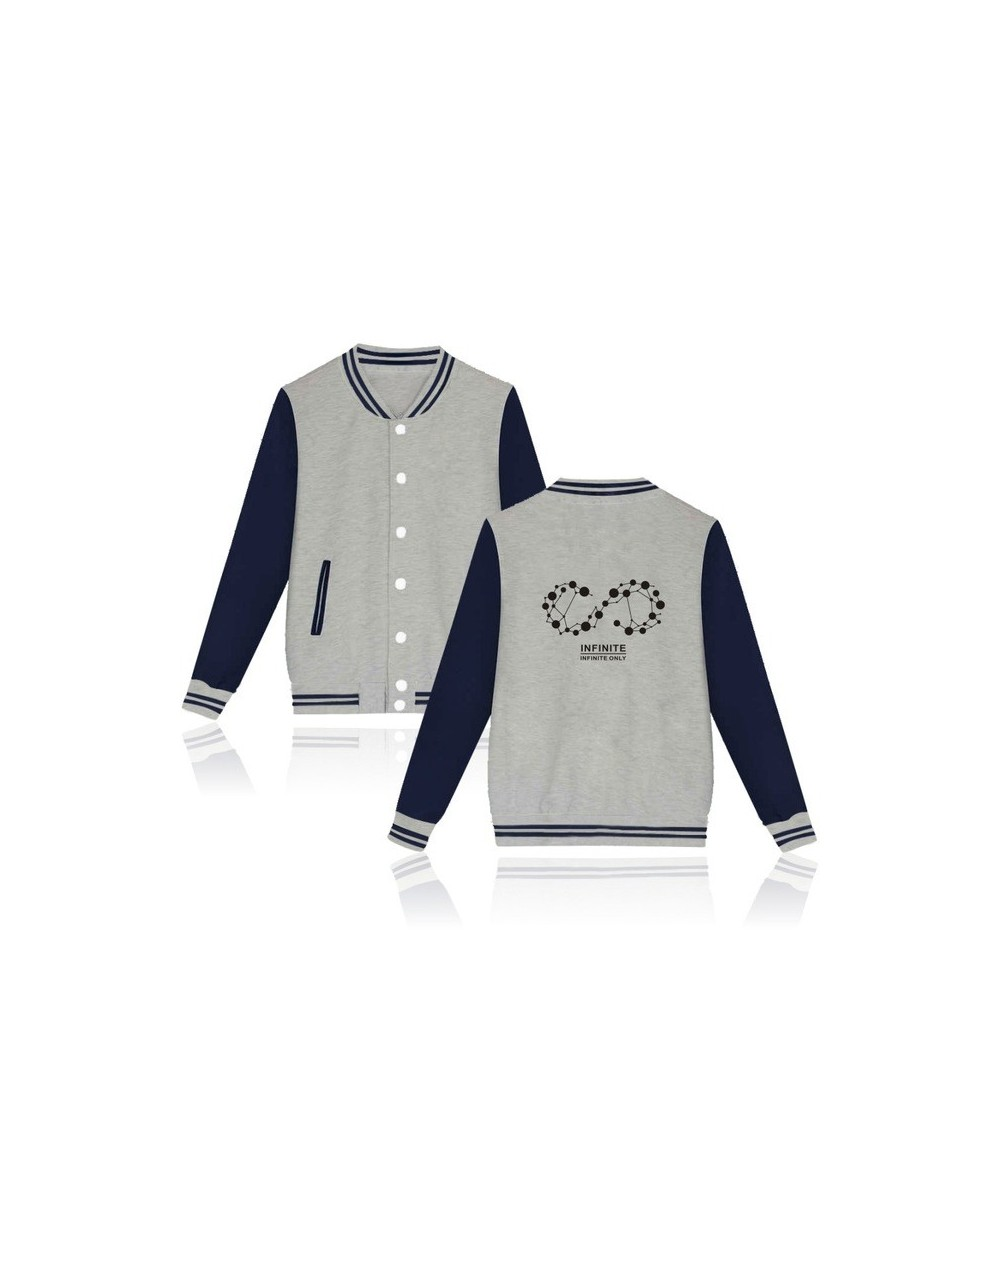 Kpop Infinite Baseball Uniform Women Men Fashion 5th Album Fans Supportive Hoodies Long Sleeve Loose Women Crewneck - Gray -...